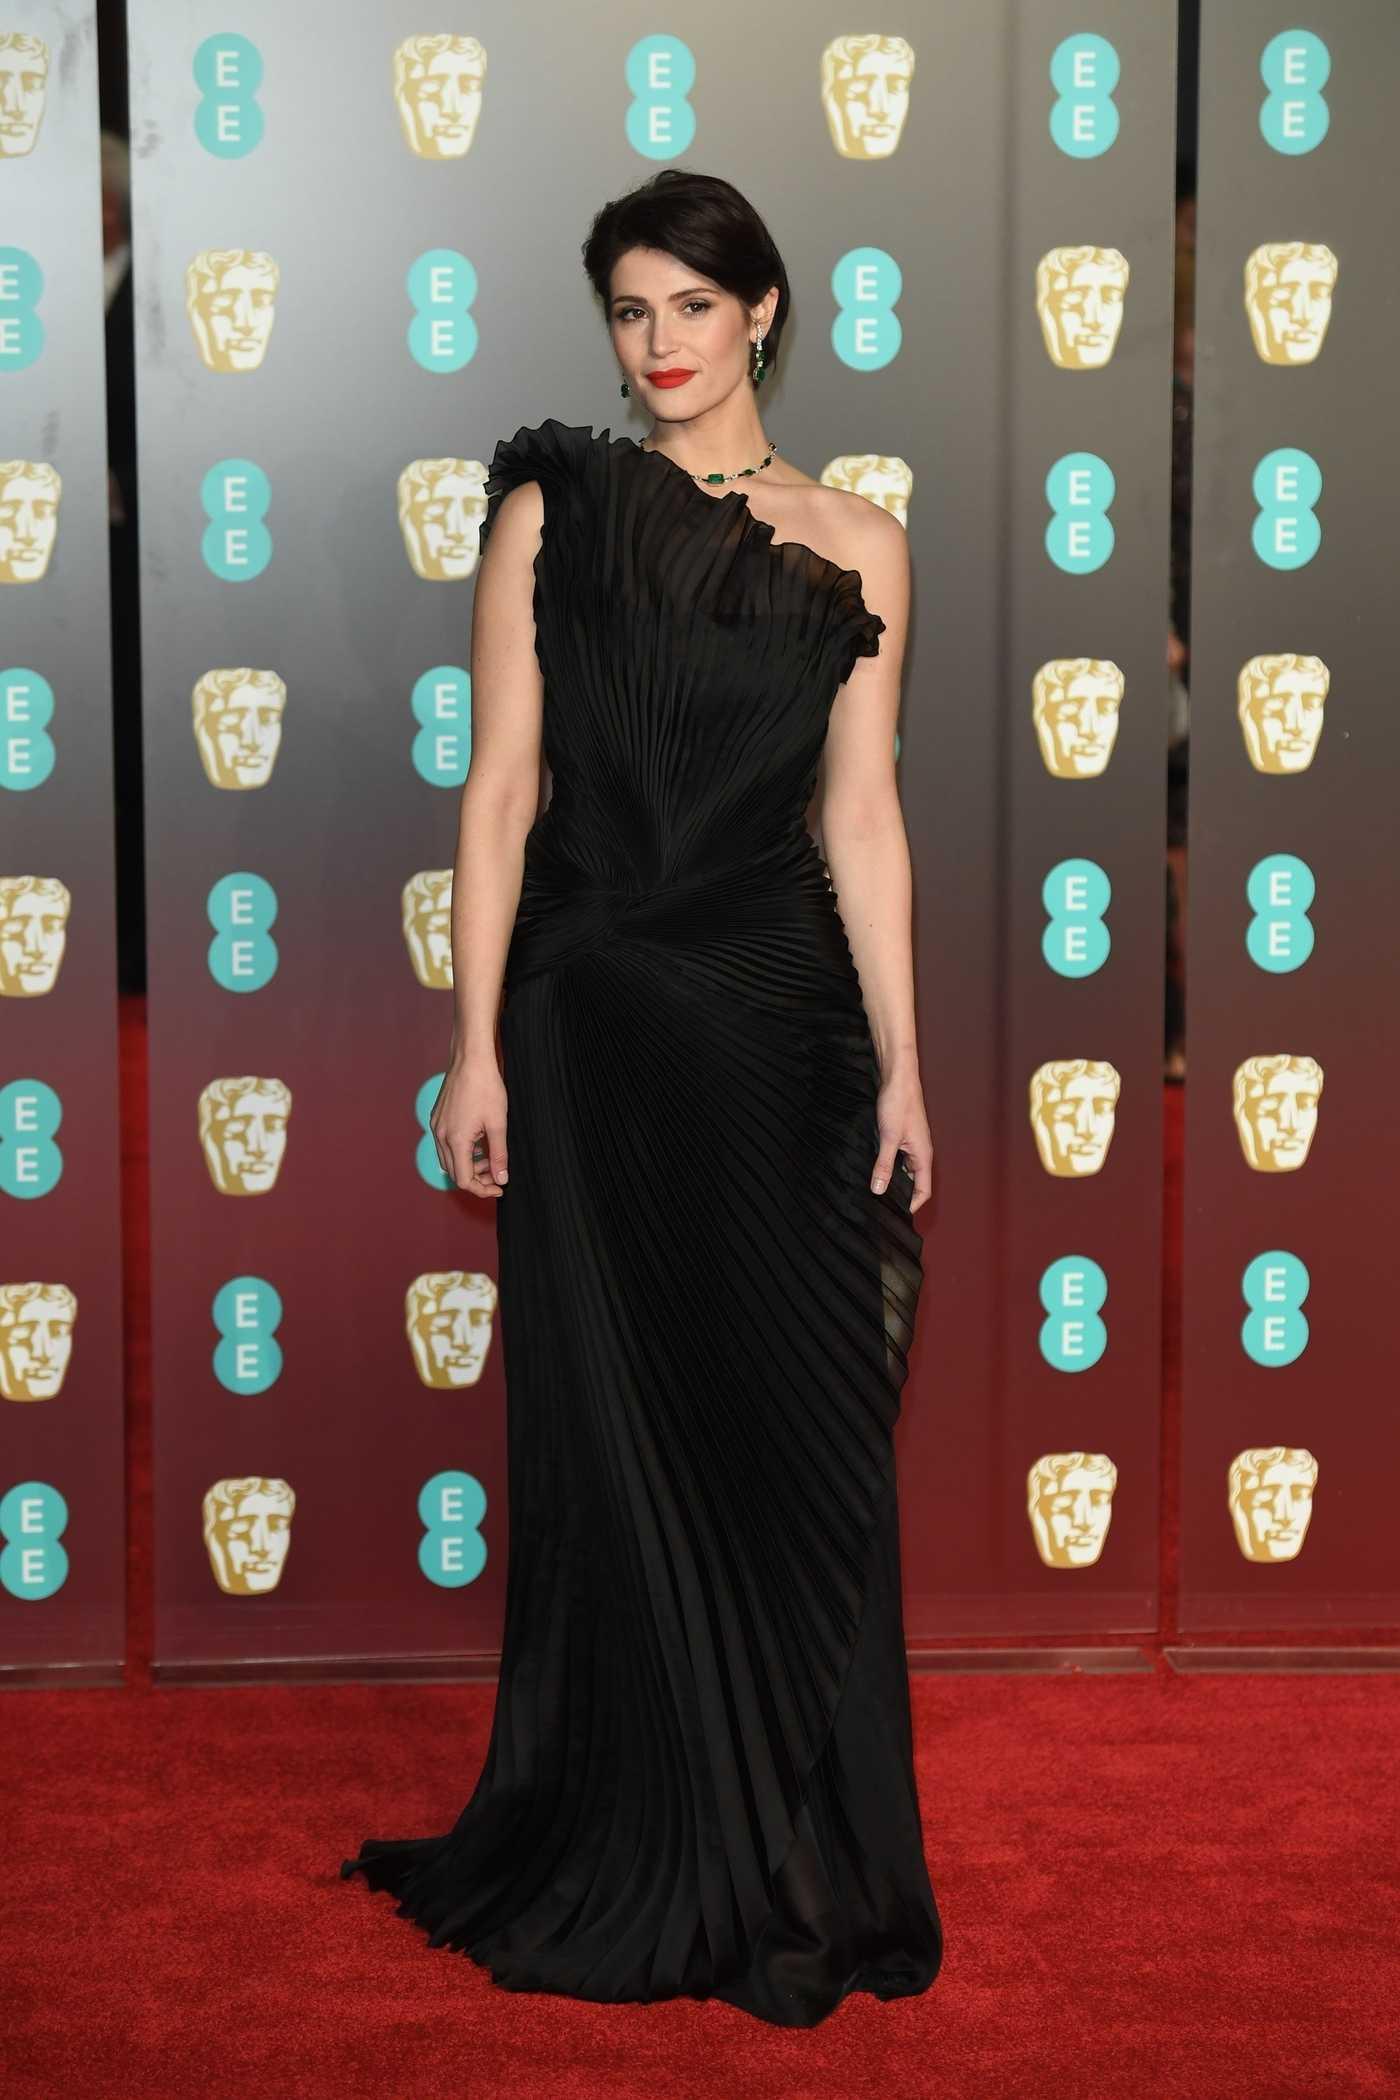 Gemma Arterton at the 71st British Academy Film Awards at Royal Albert Hall in London 02/18/2018